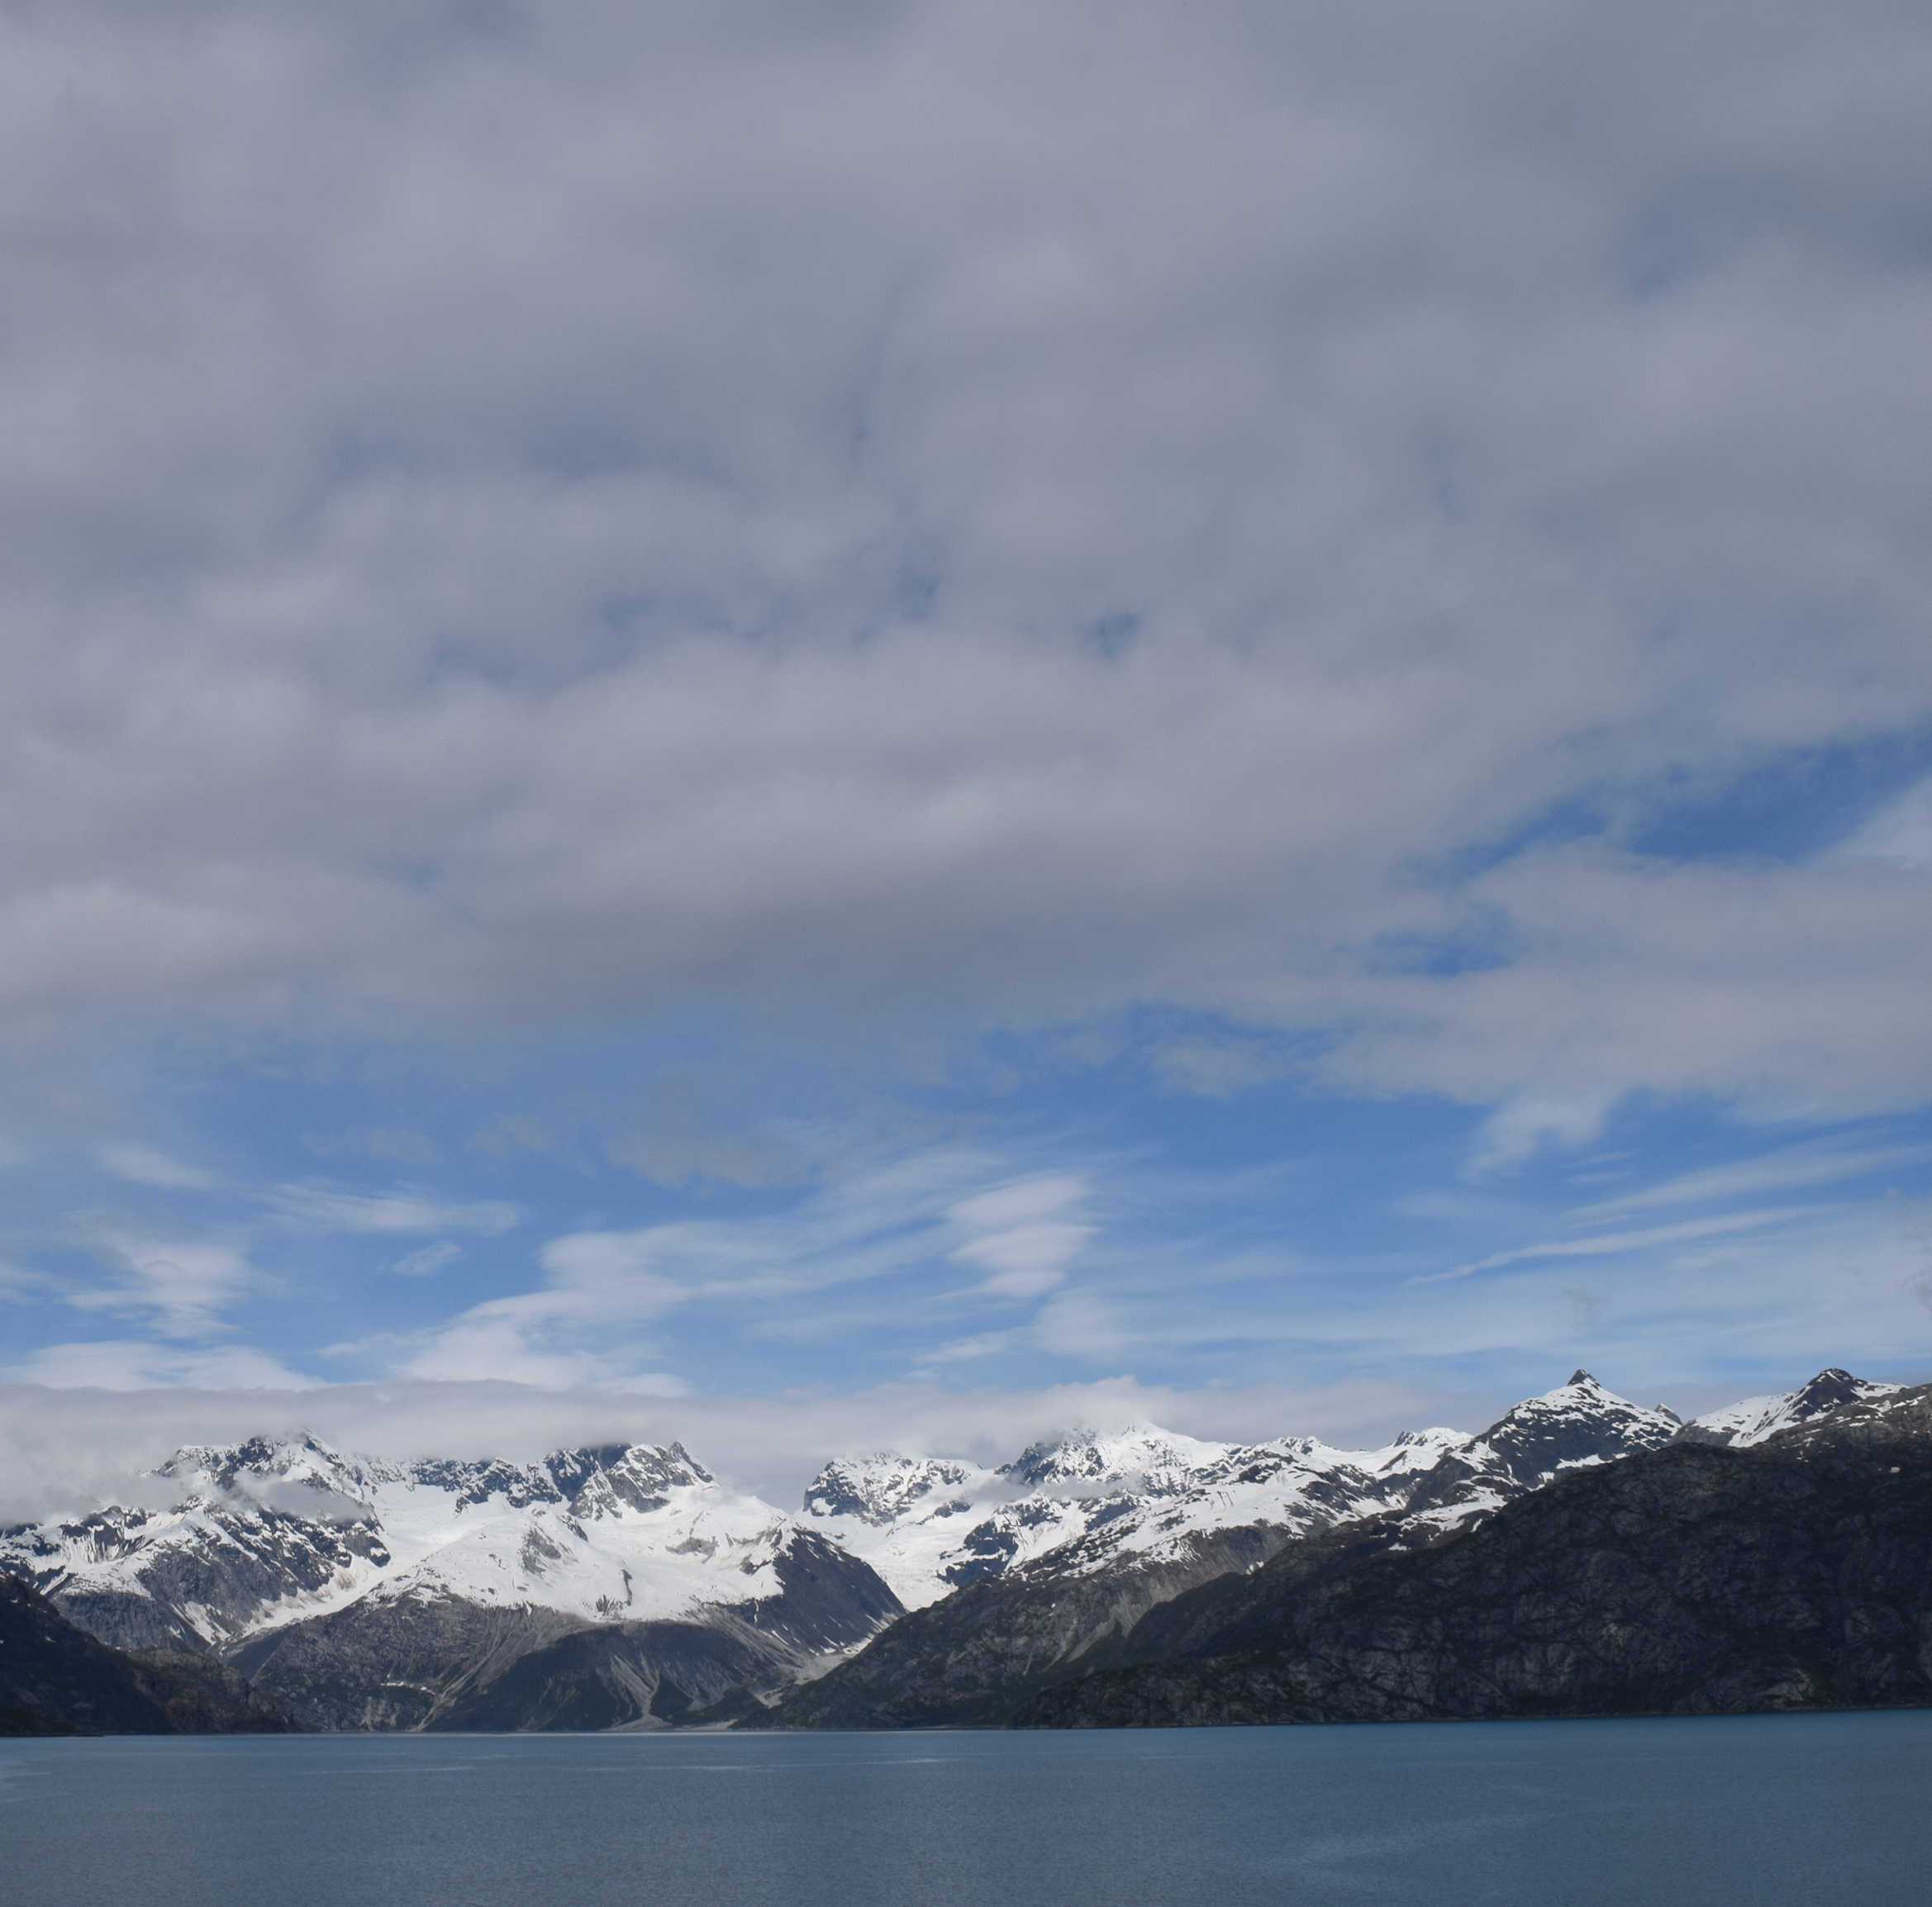 25 Photos To Inspire You To Take An Alaskan Cruise - Alaska Cruise - Cruise To Alaska - Alaska In Summer - Alaskan Wildlife - Alaska Glaciers - Communikait by Kait Hanson